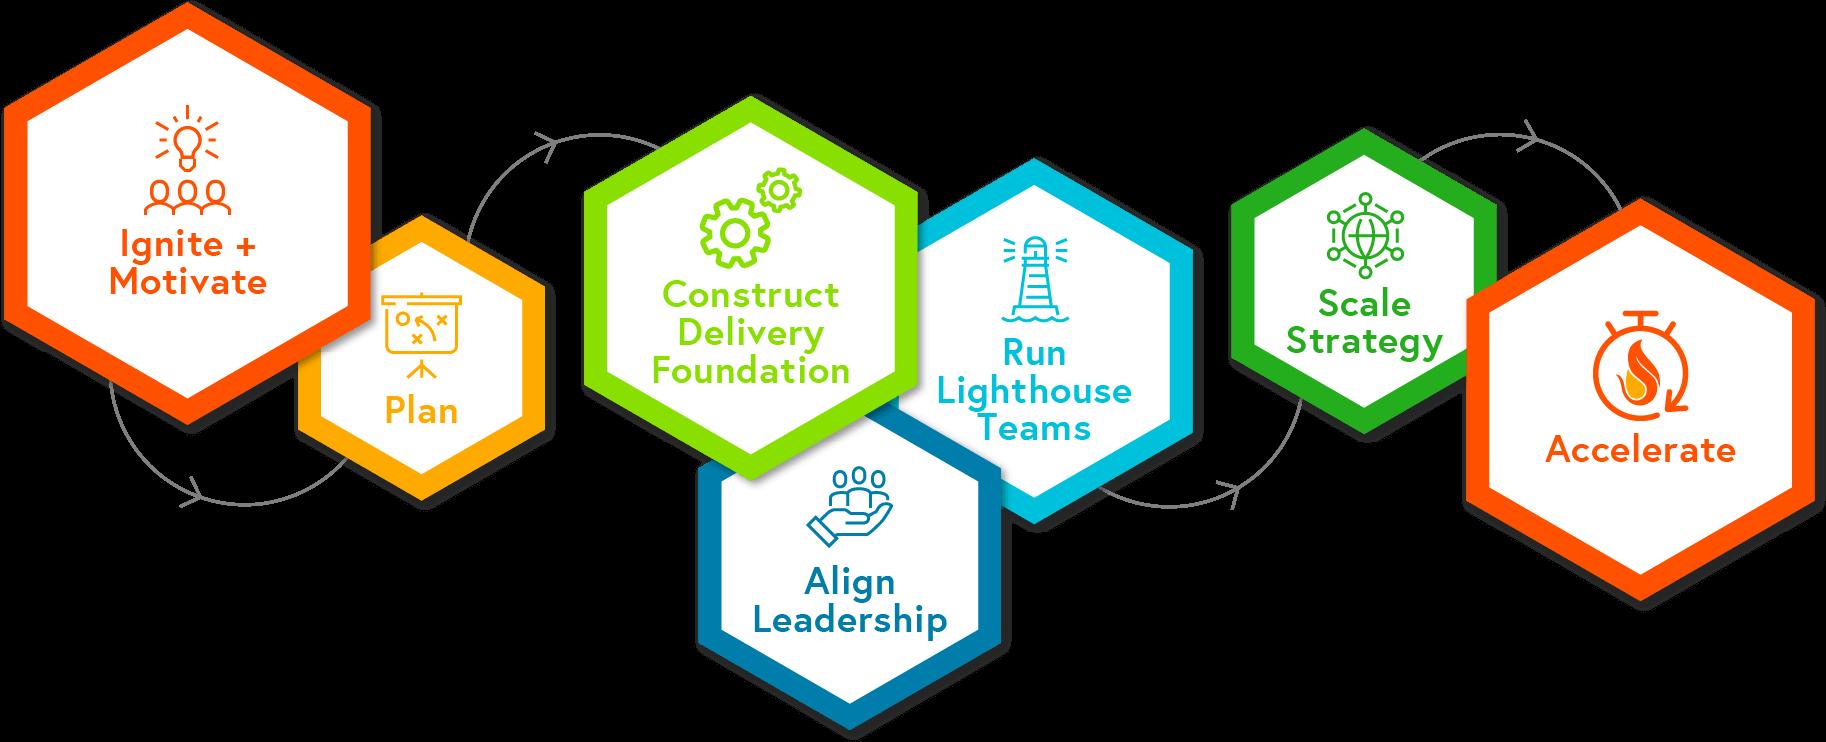 Image of the Ignite Framework Diagram.